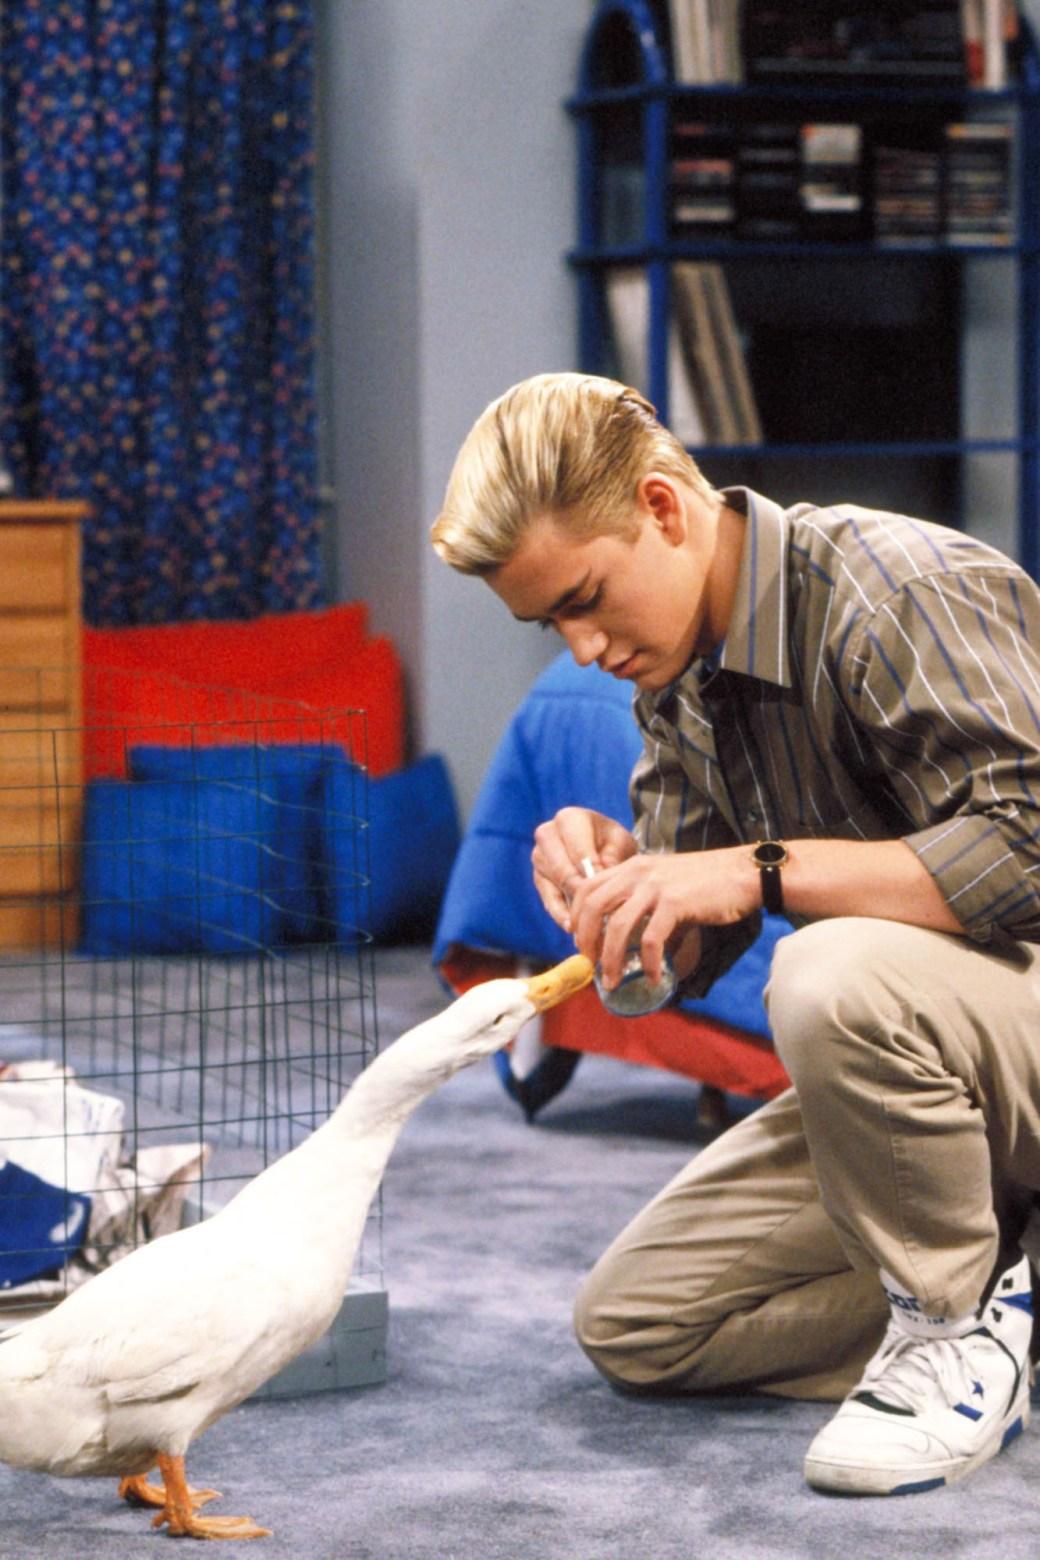 SAVED BY THE BELL, Mark Paul Gosselaar, Season 3, 1989-1993 (c)NBC / Courtesy: Everett Collection.